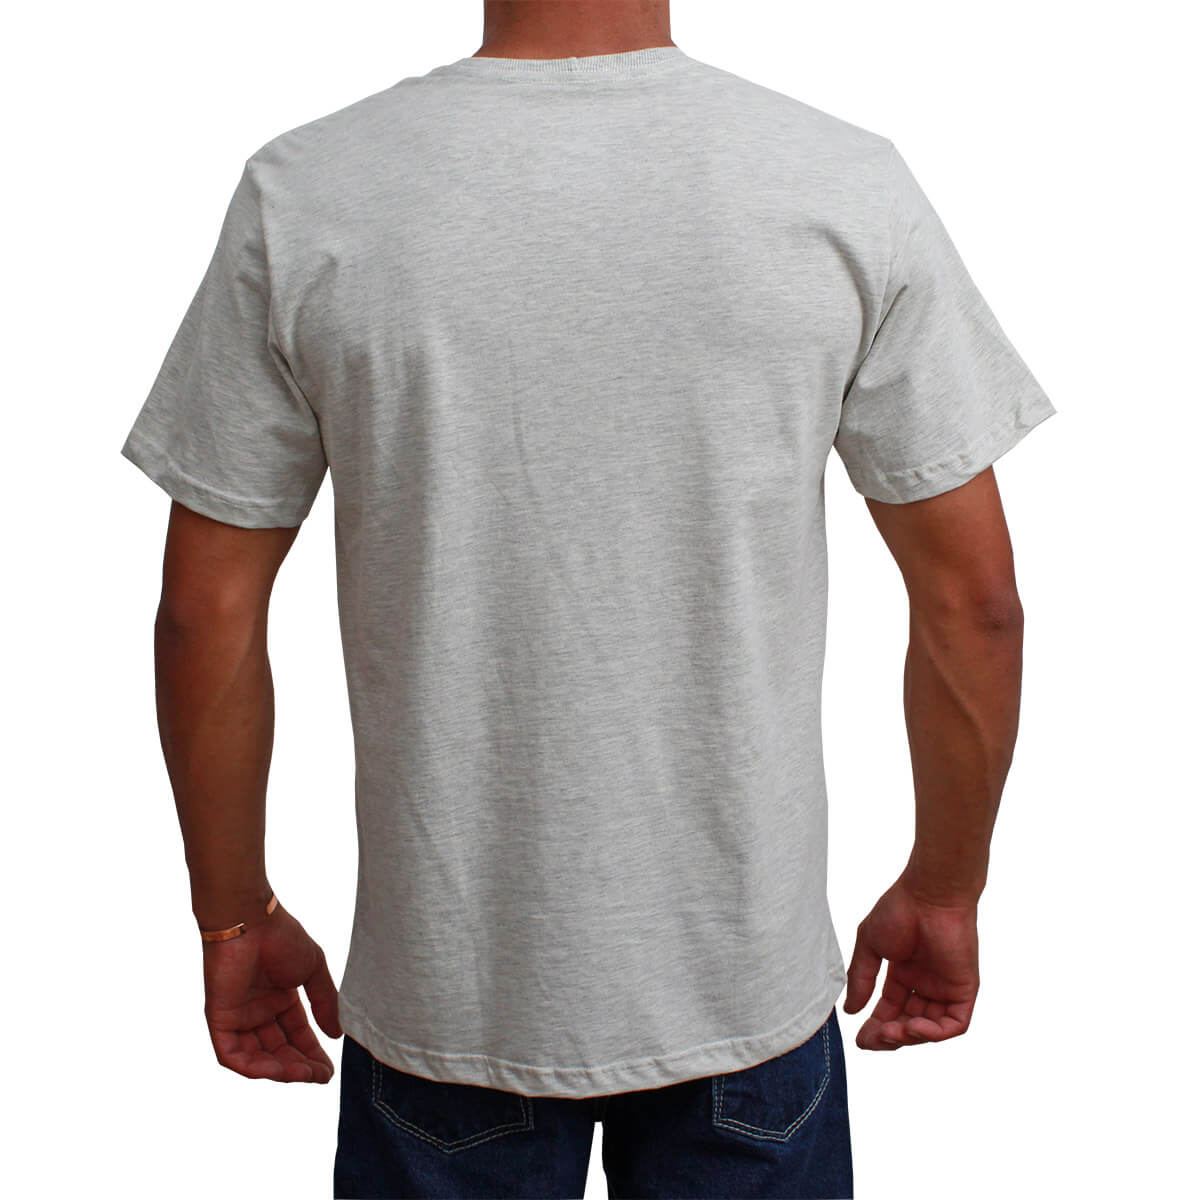 Camiseta Indian Farm Masculina Cinza Mescla The Silver